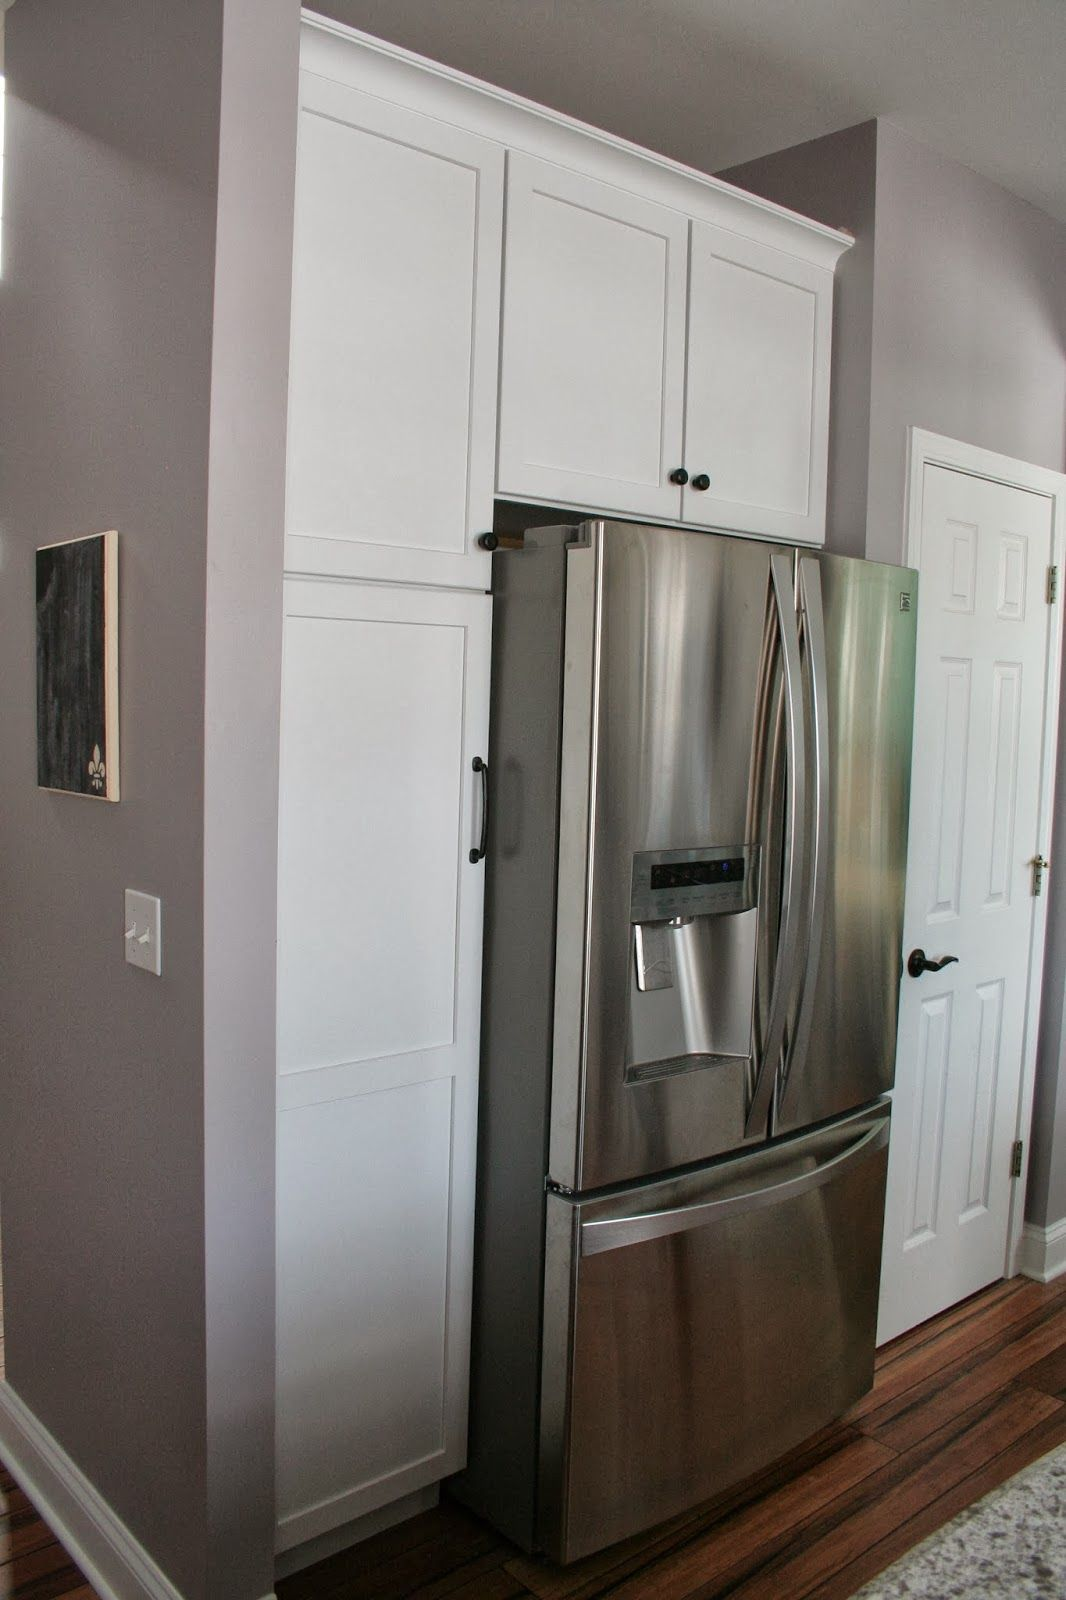 Pantry surround for around the refrigerator. | Kitchen Ideas | Pinterest